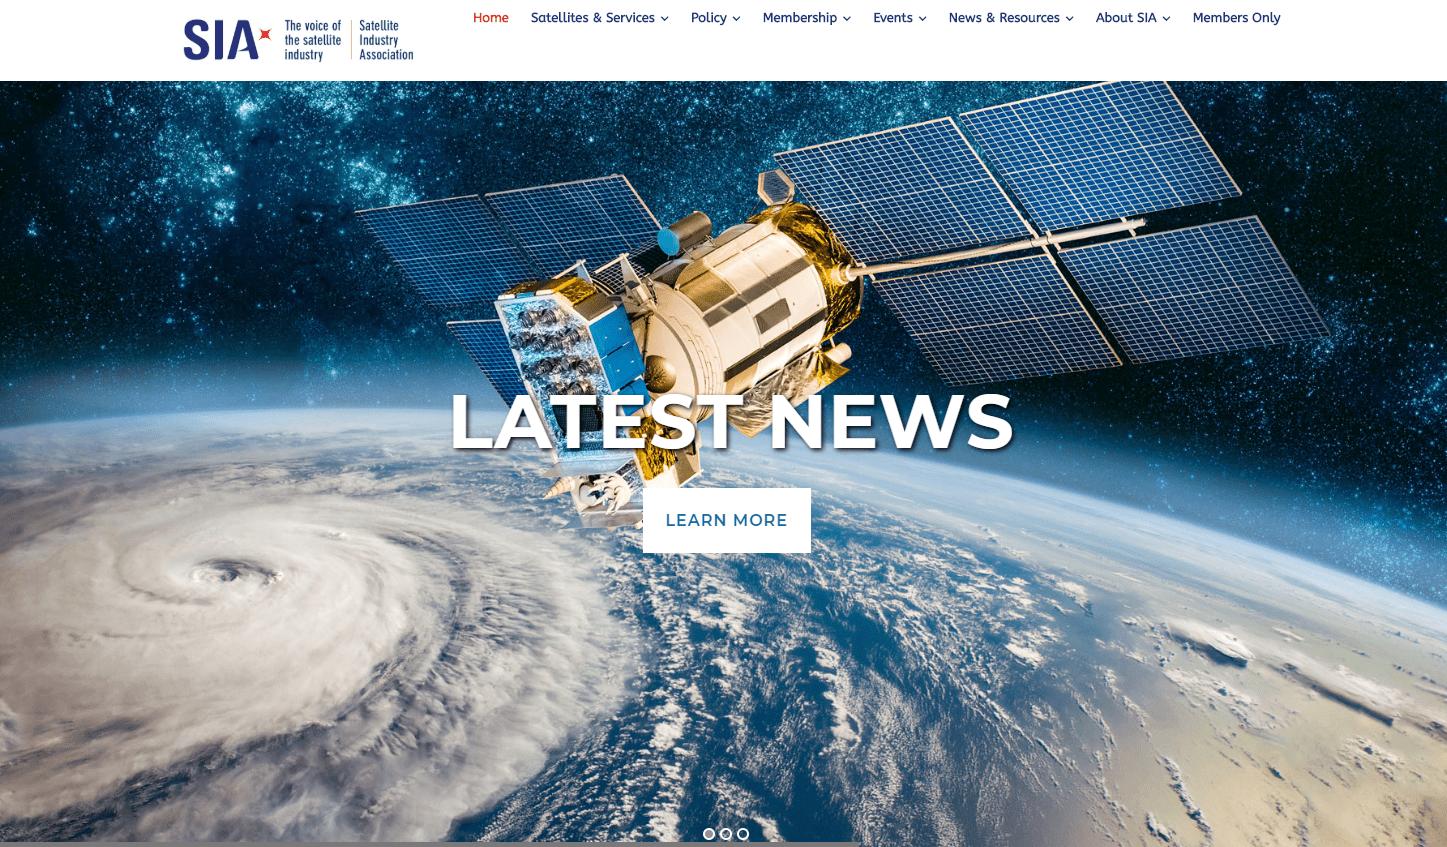 Satellite Industry Association